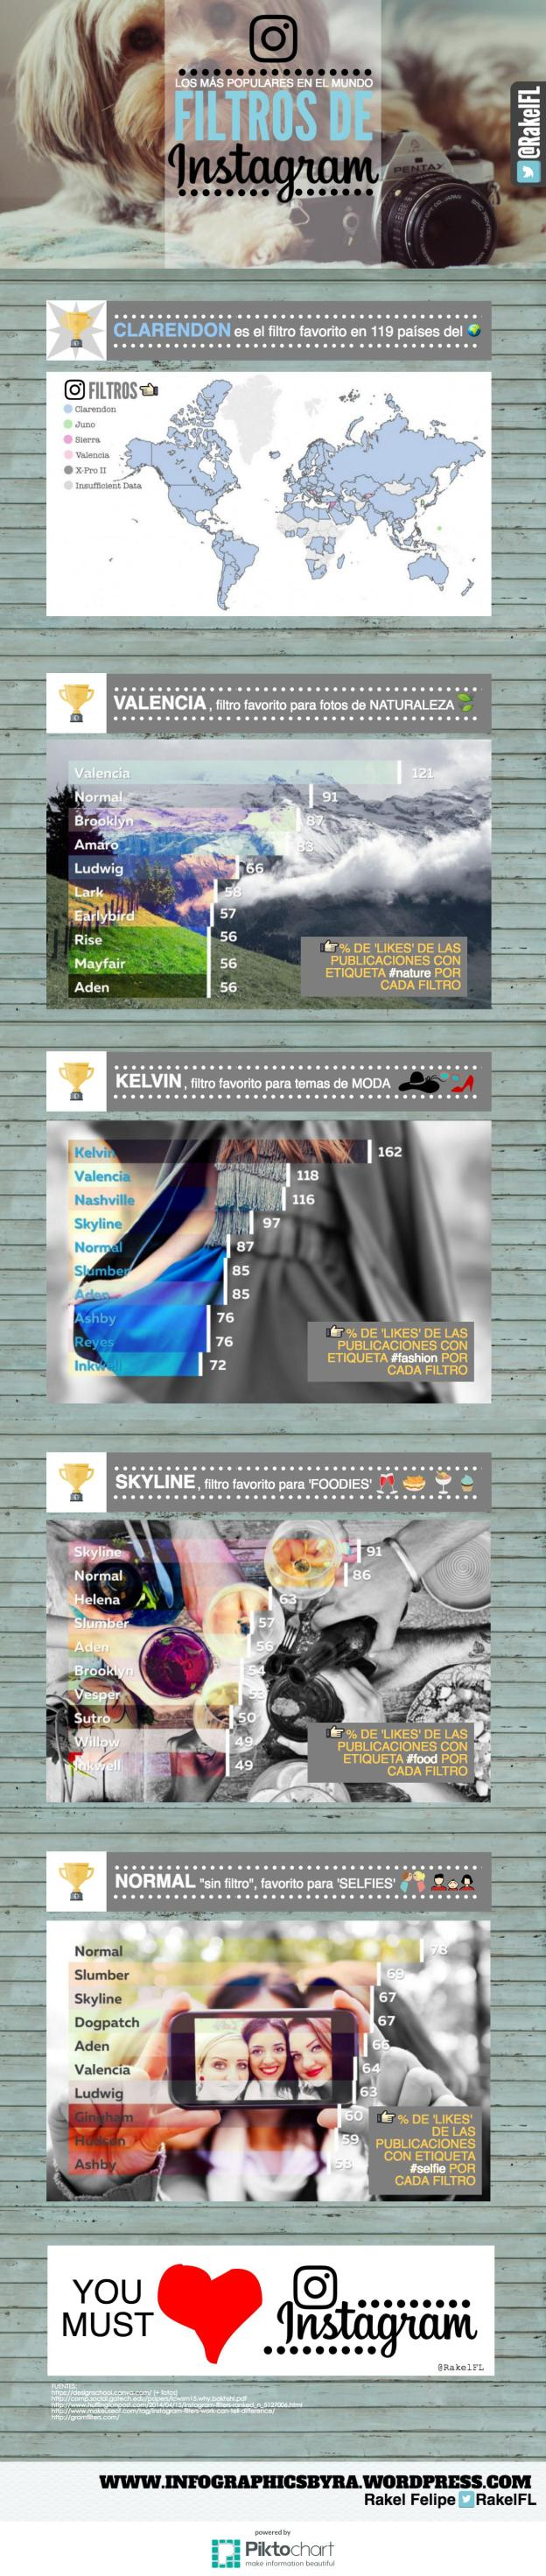 los-filtros-mas-usados-en-instagram-infografia-rakel-felipe